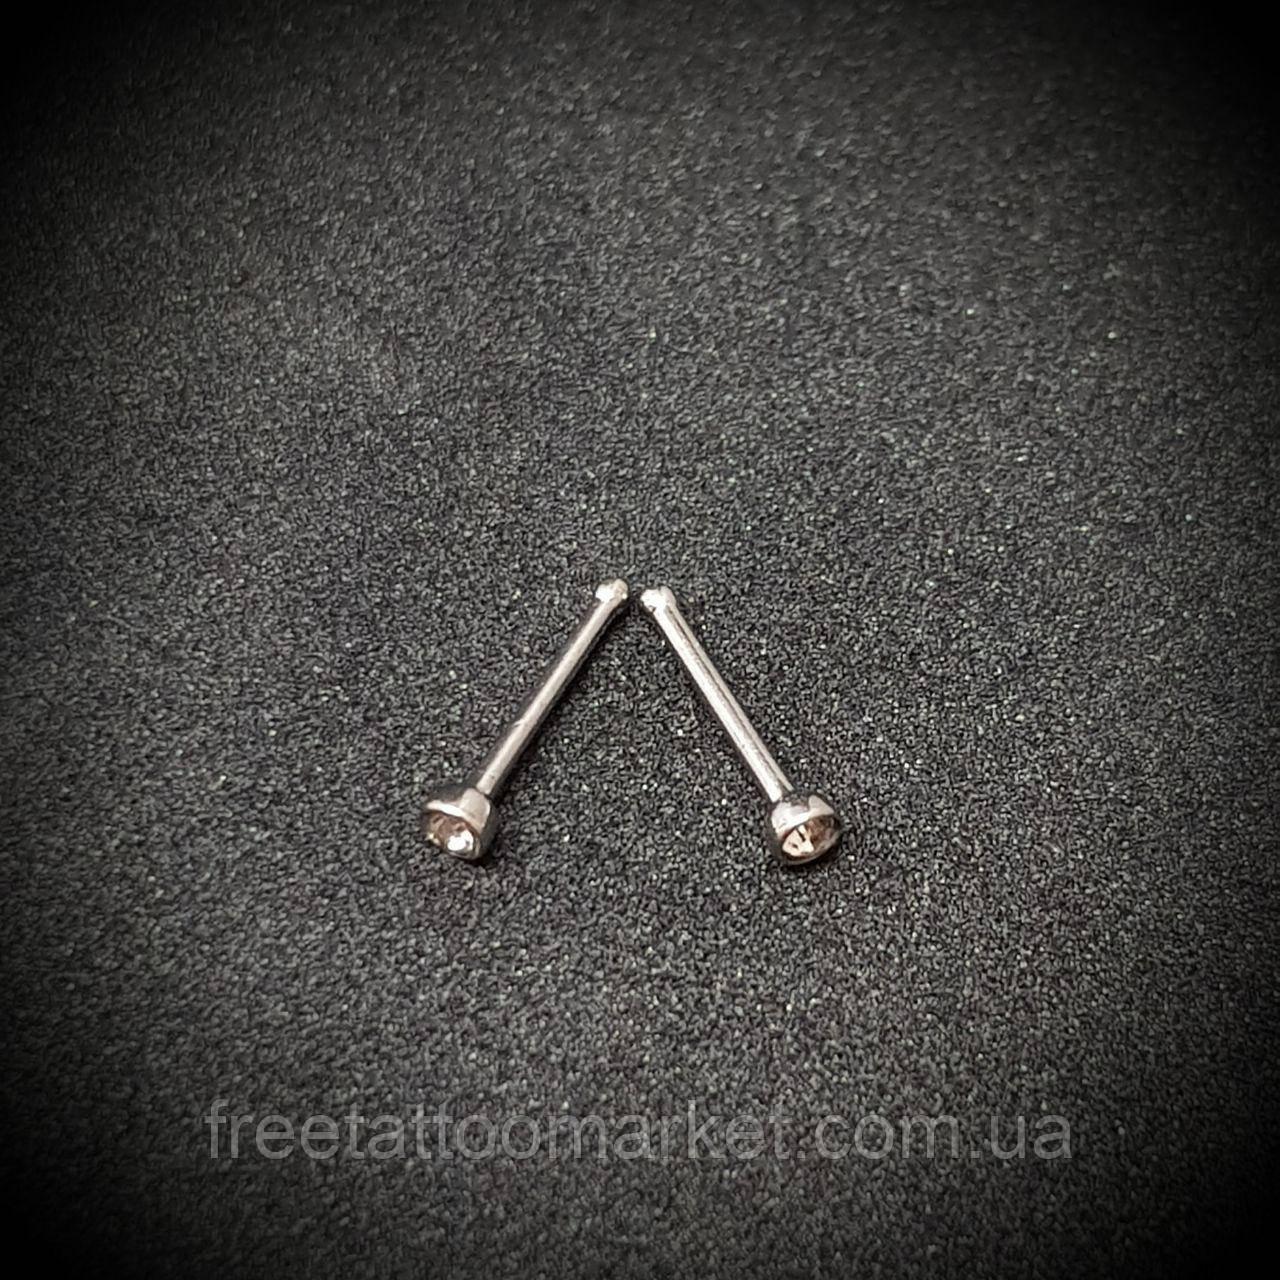 Серьга в нос прямая с камнем (нострил) 0.8 х 6.5 х 2 мм (титан)